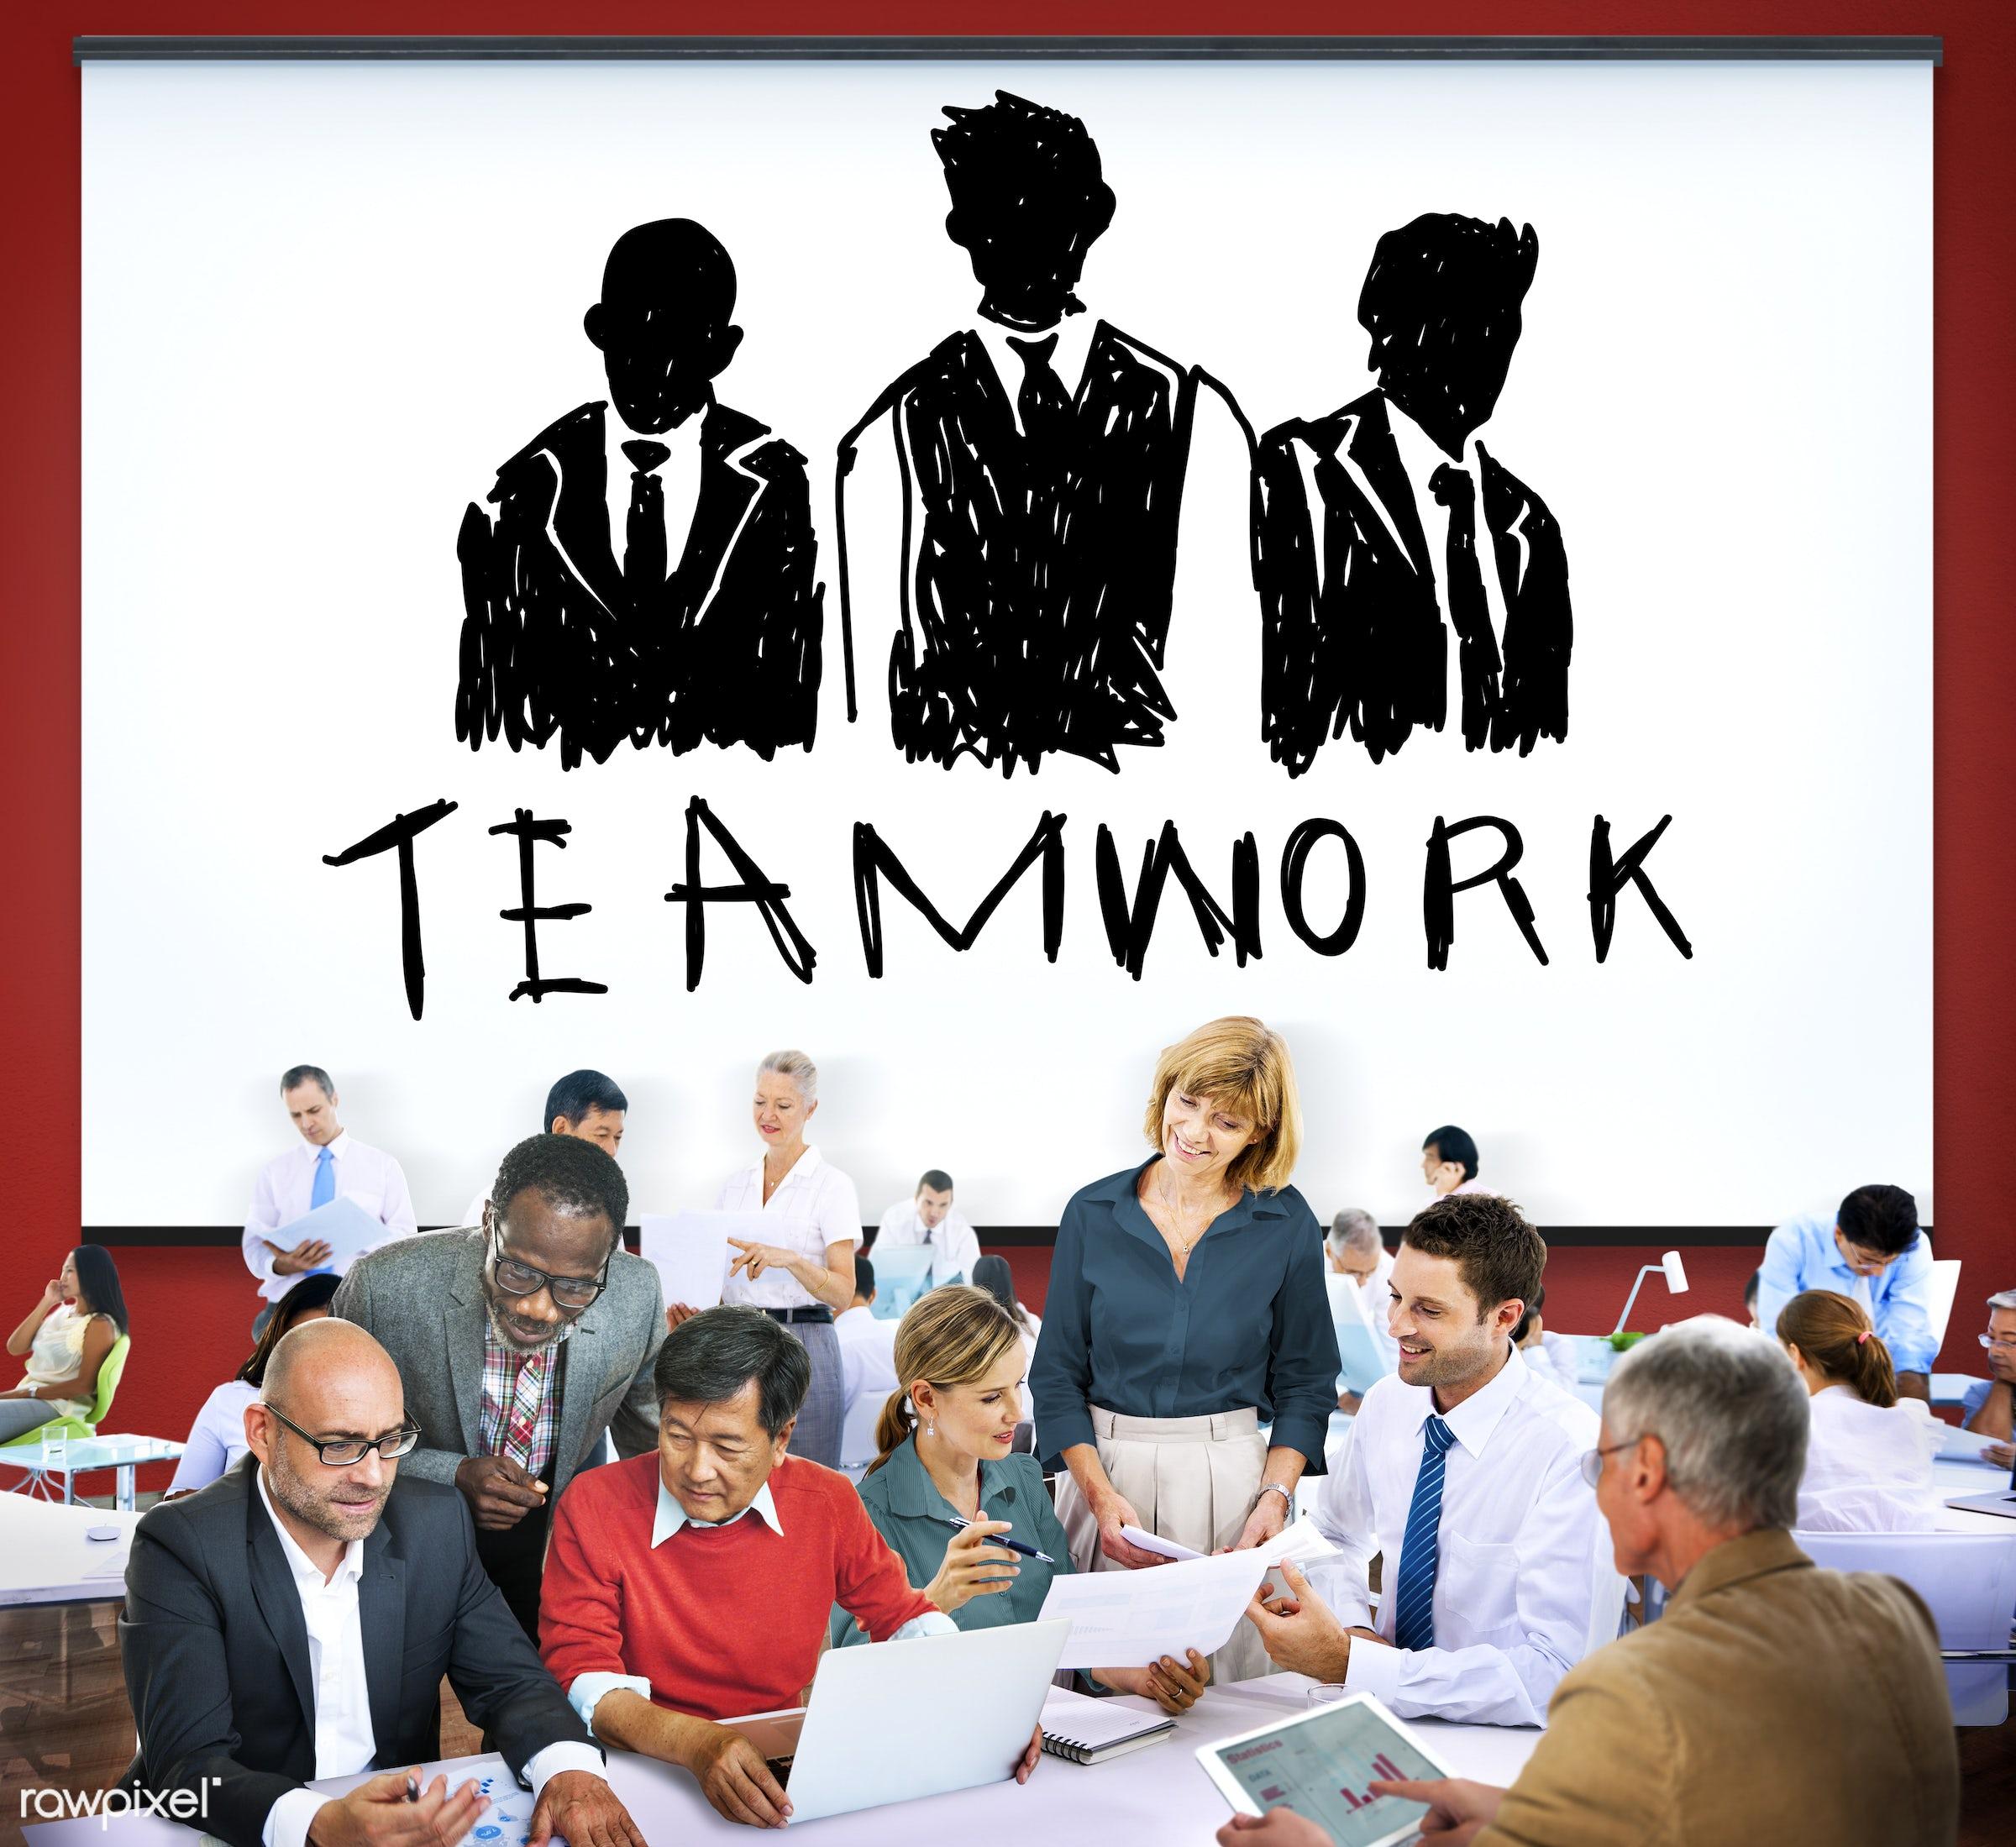 achievement, ambition, analysis, business, business people, businessmen, businesswomen, busy, collaboration, communication,...